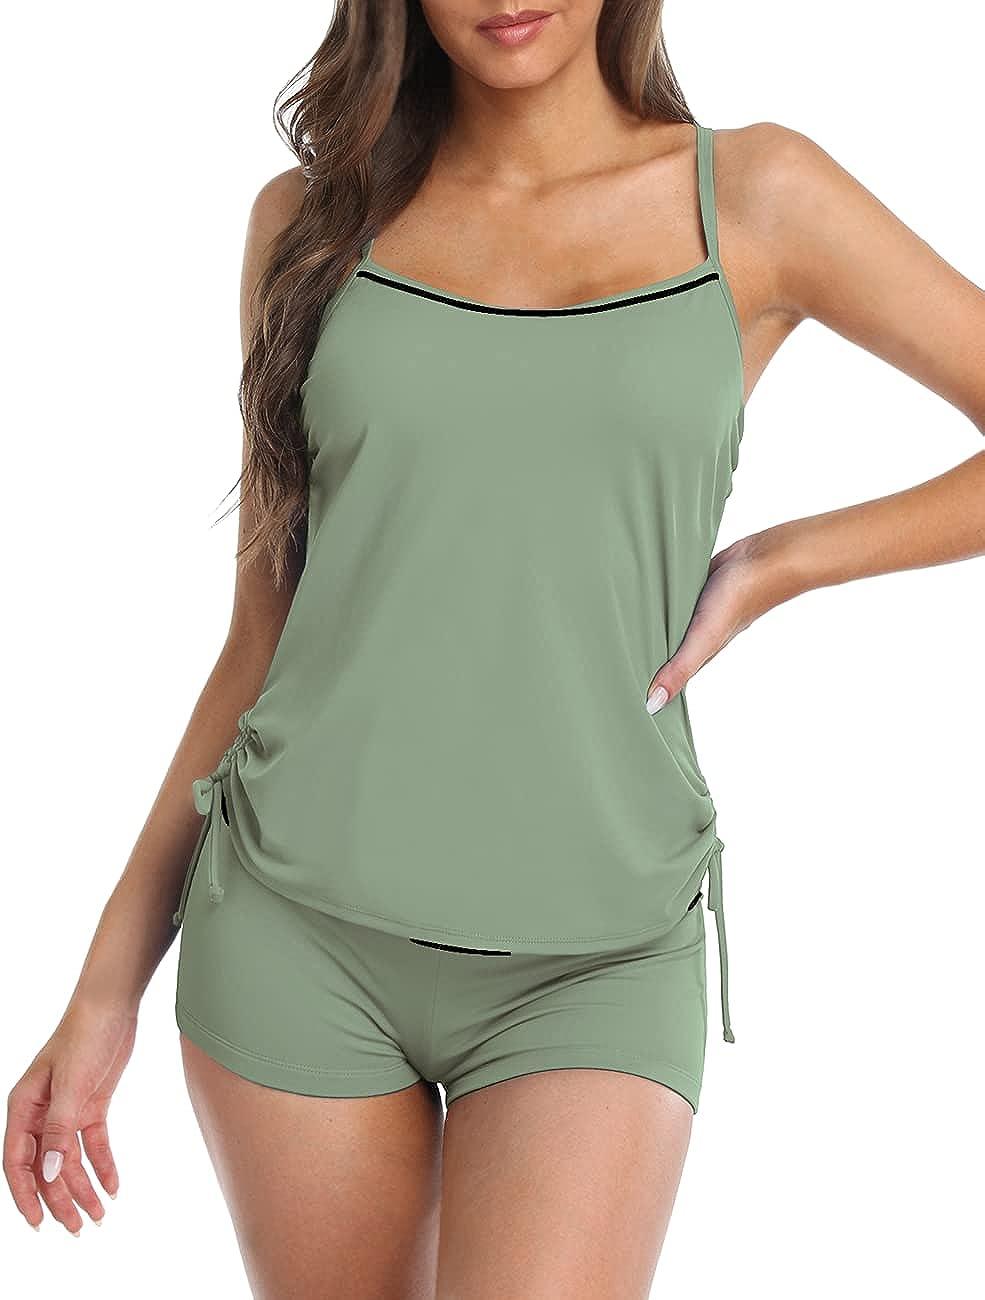 Hilor Tankini Swimsuits for Women Racerback Two Piece Bathing Suit